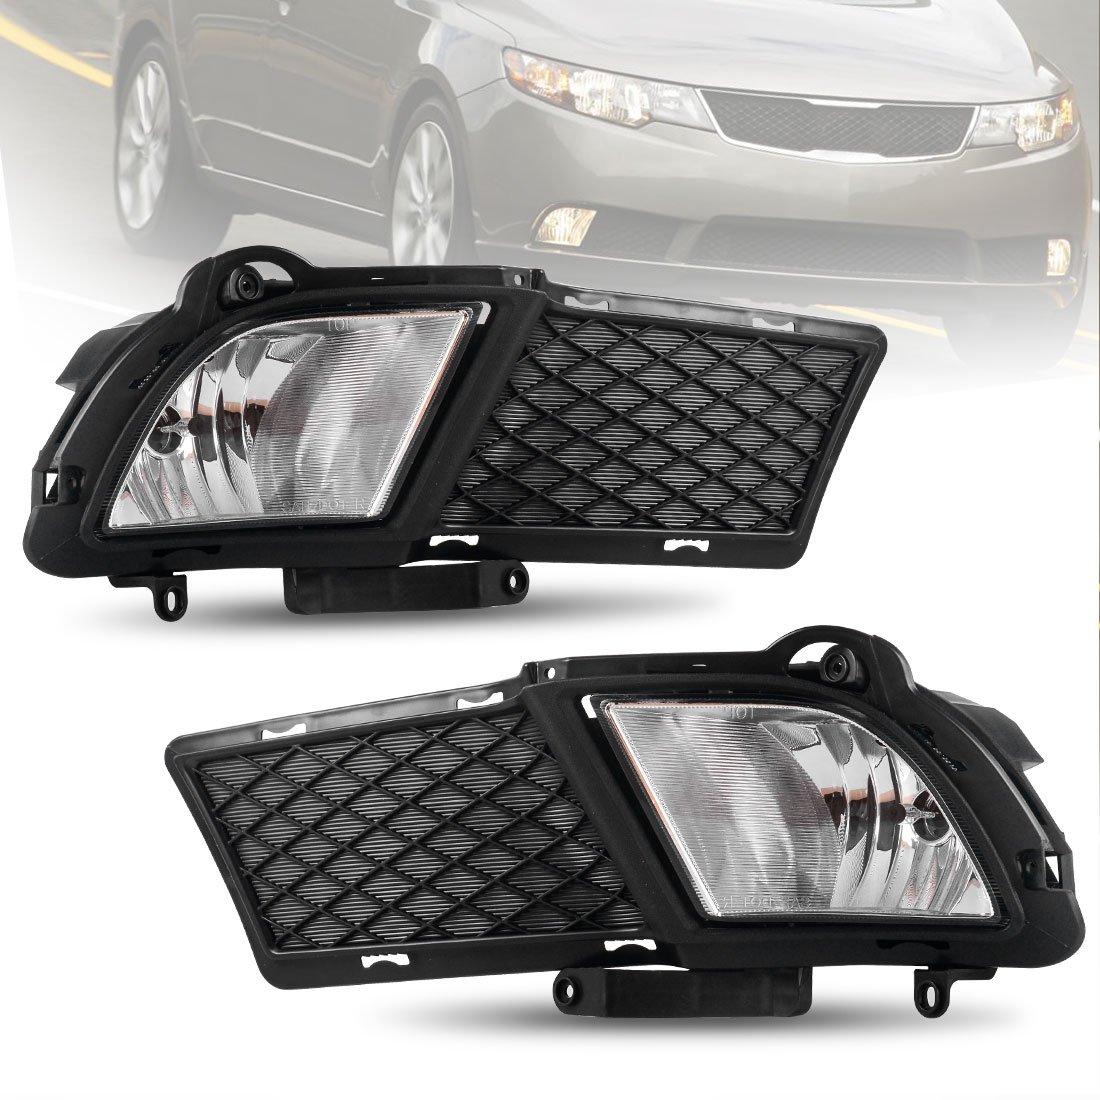 Amazon.com: AUTOSAVER88 Fog Lights for Kia Forte Sedan 4 Door 2010 2011  2012 (OE Style 881 Halogen 12V 27W Bulbs & Wiring Harness): Automotive